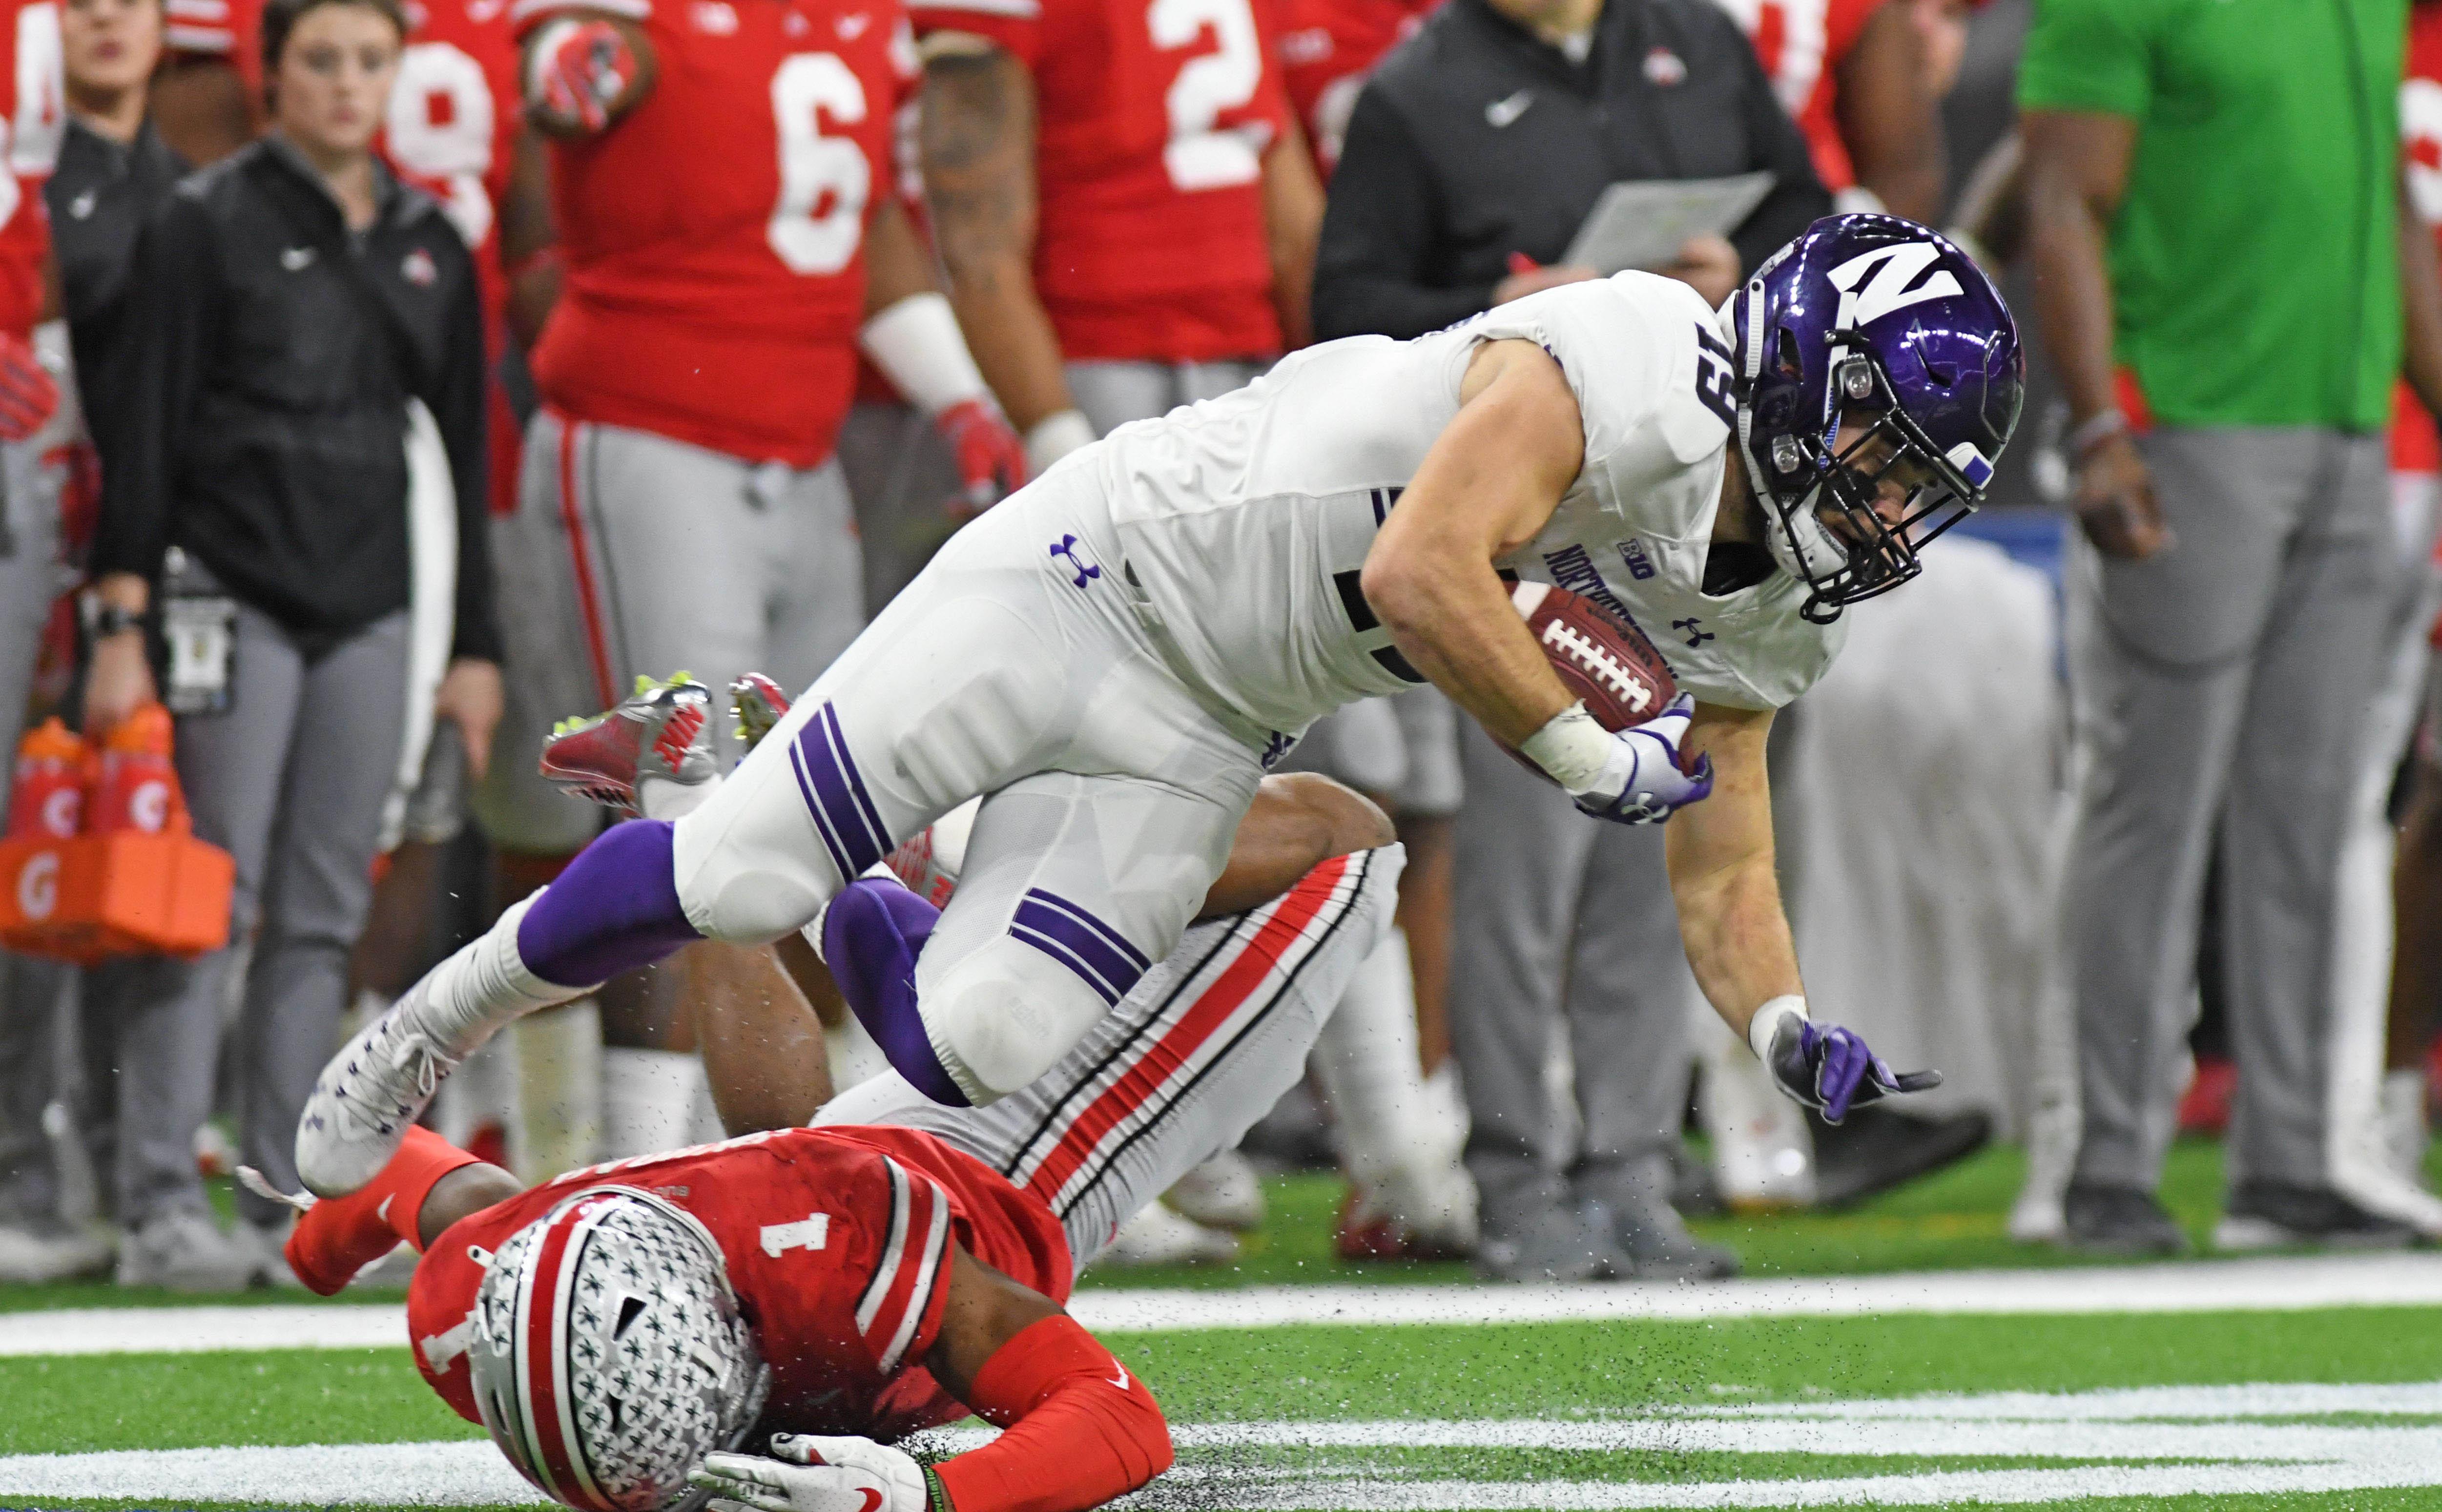 NCAA Football: Big Ten Conference-Football Championship-Northwestern vs Ohio State